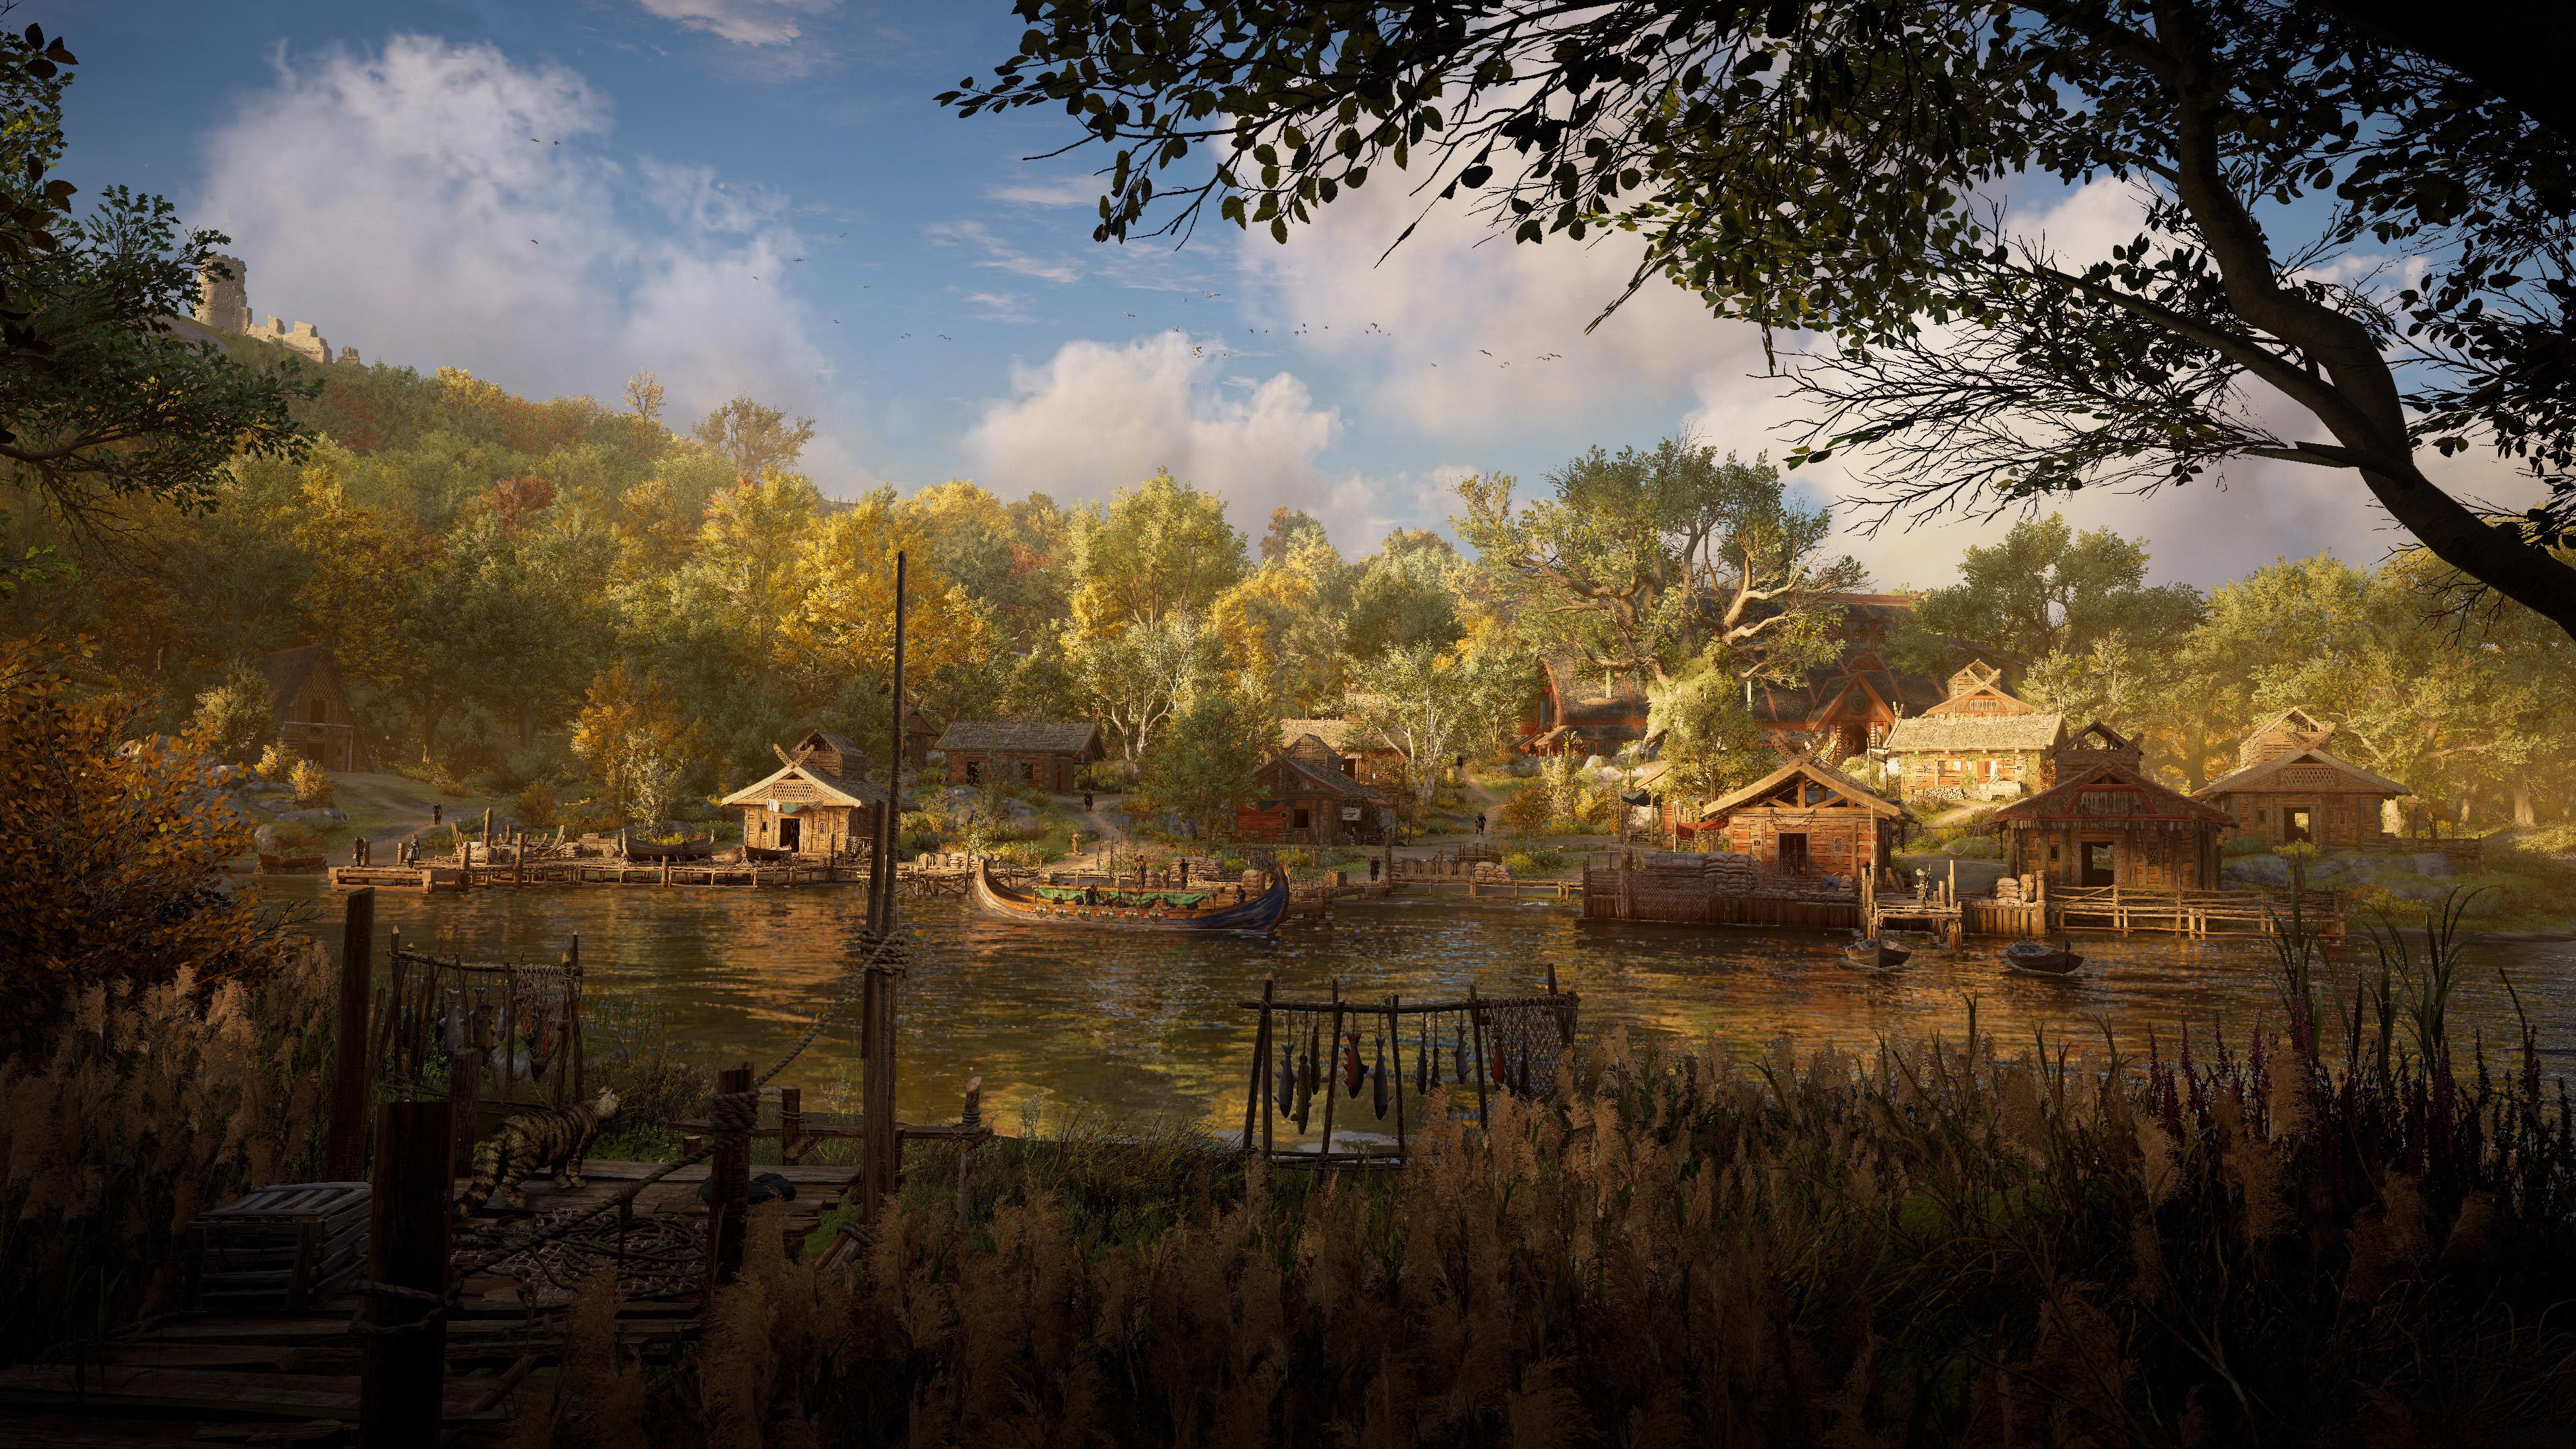 Assassins Creed Valhalla Background Wallpaper Hd Games 4k